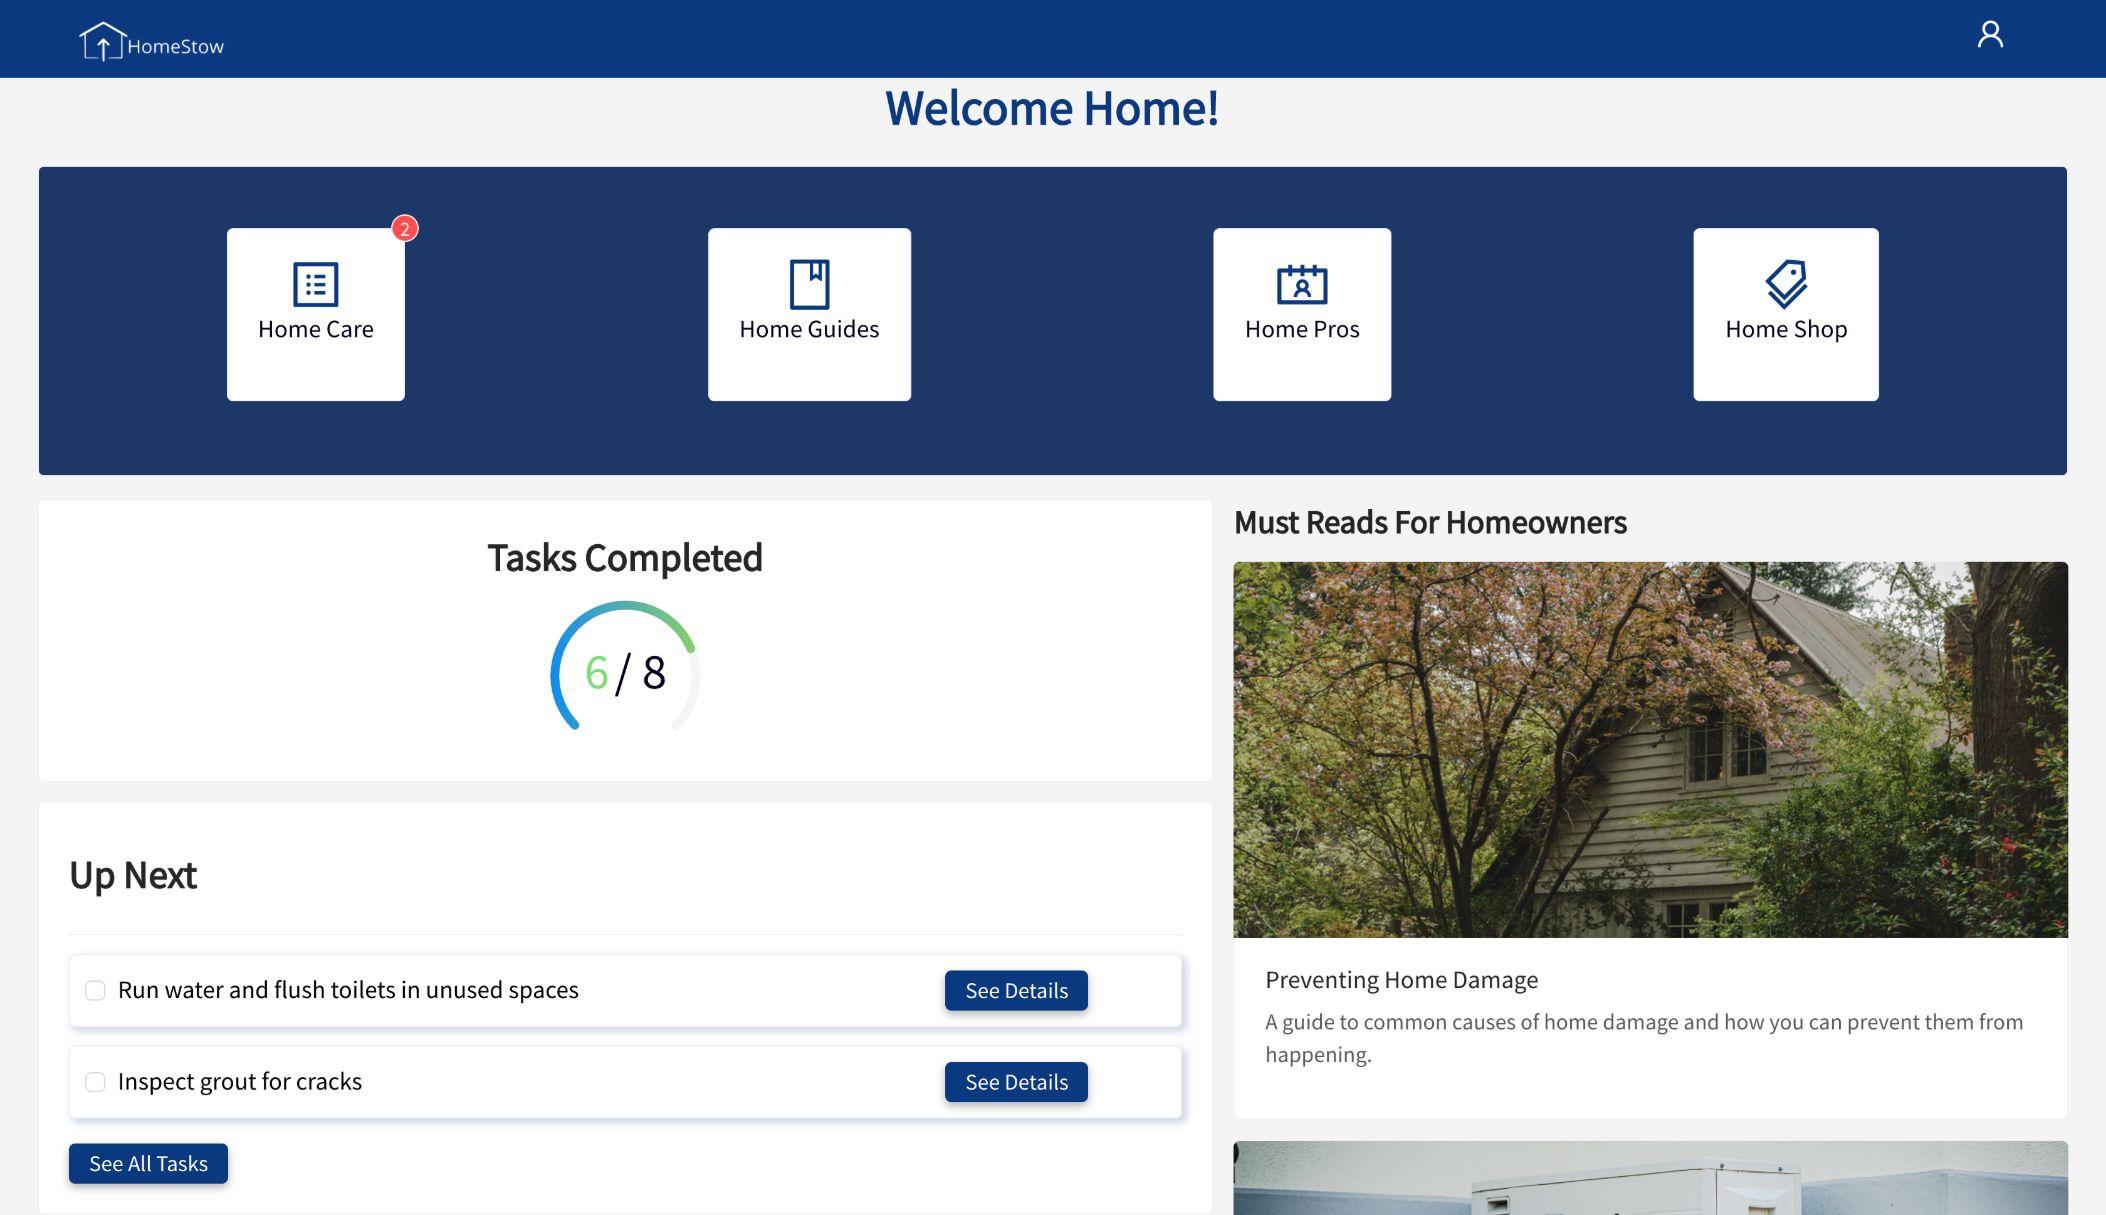 HomeStow home dashboard